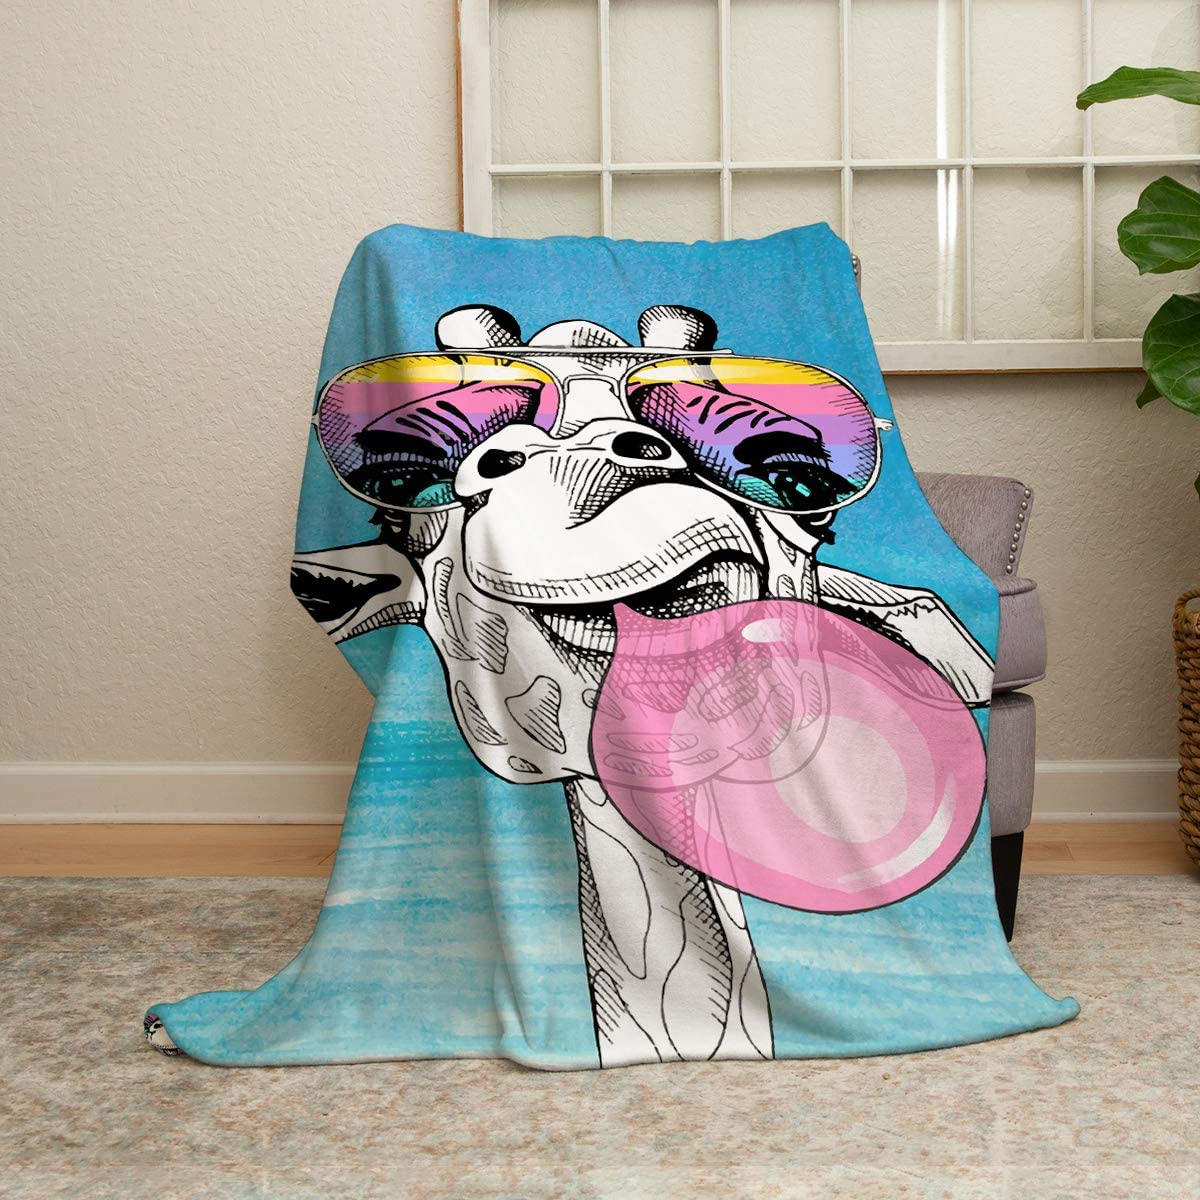 Giraffe Throw Blanket 40'' Be super welcome x Fun Fluffy 60'' Cartoon Watercolor Max 71% OFF